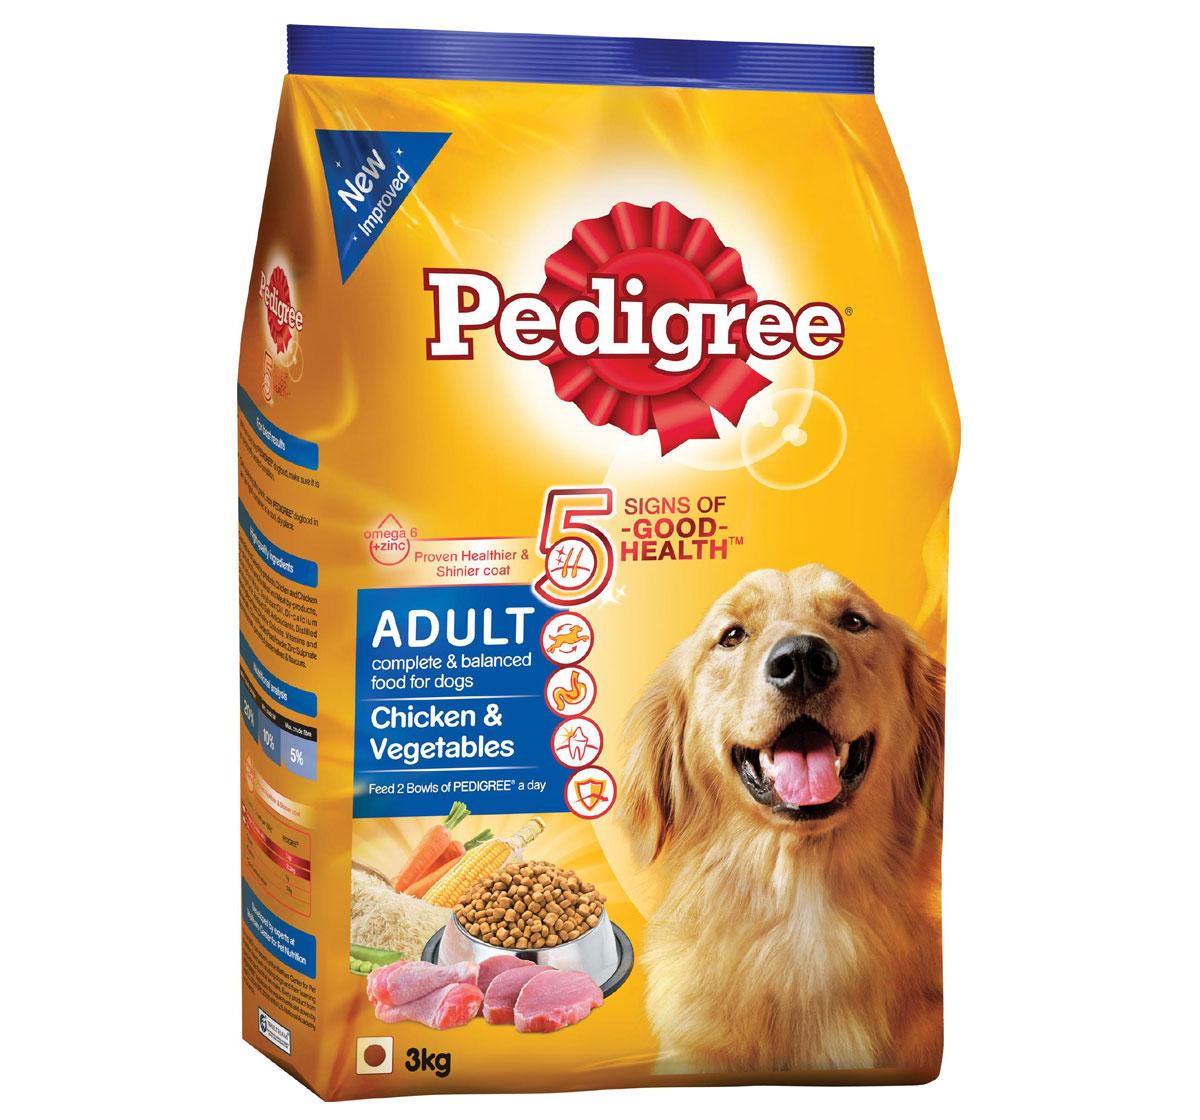 Jual Murah Isi 6 Pack Pedigree Pouch 130gr Makanan Anjing Basah Rasa Dry 15kg Kering Chicken Veg Pee Wee Petshop Kucing Palembang Beef